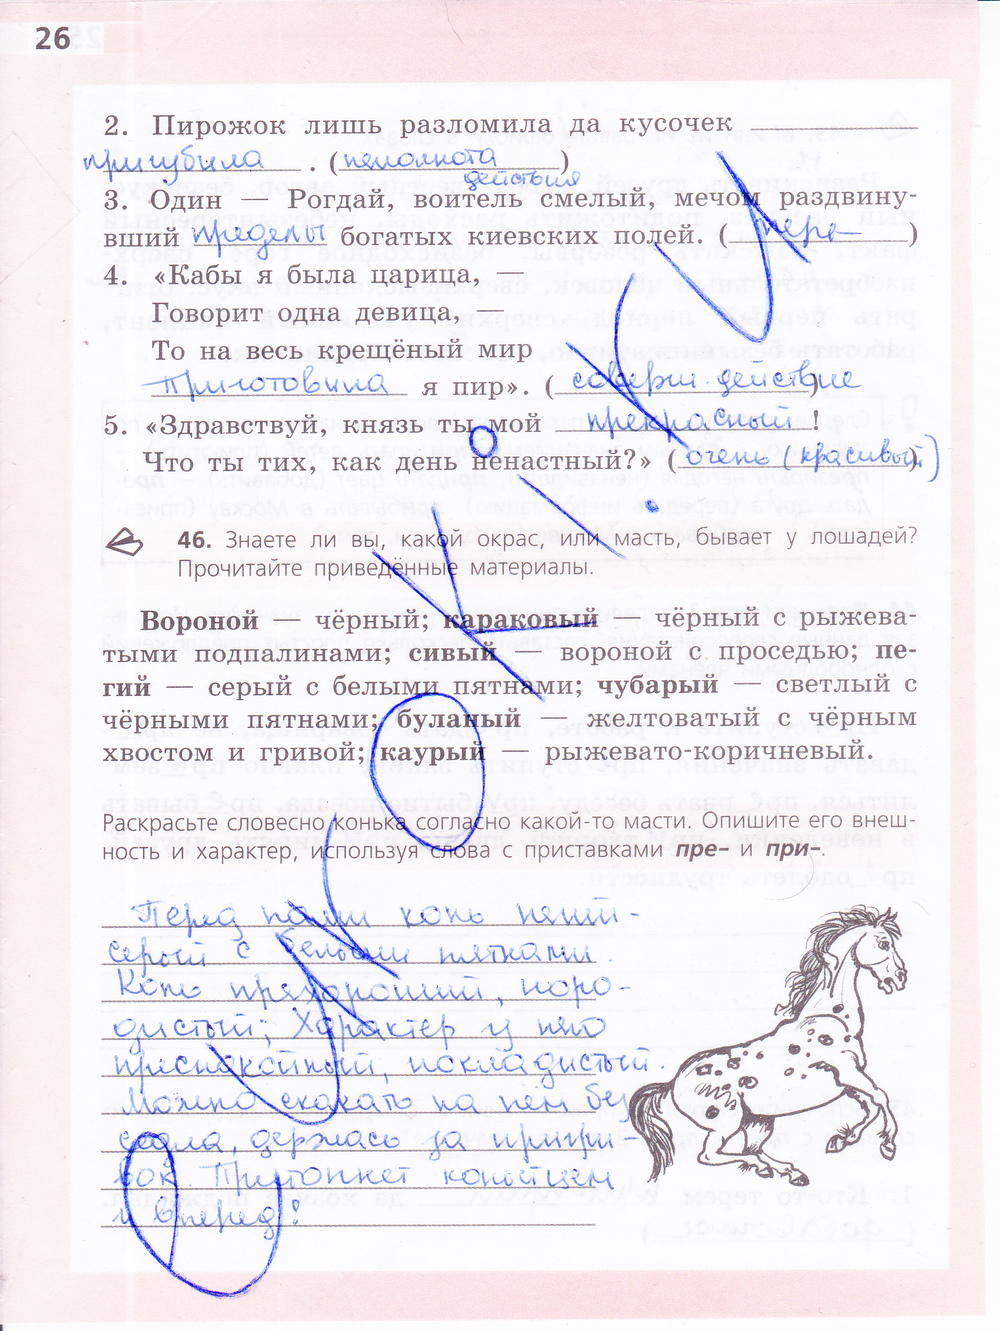 6 клаас по русскому ефремова гдз тетрадь языку рабочая